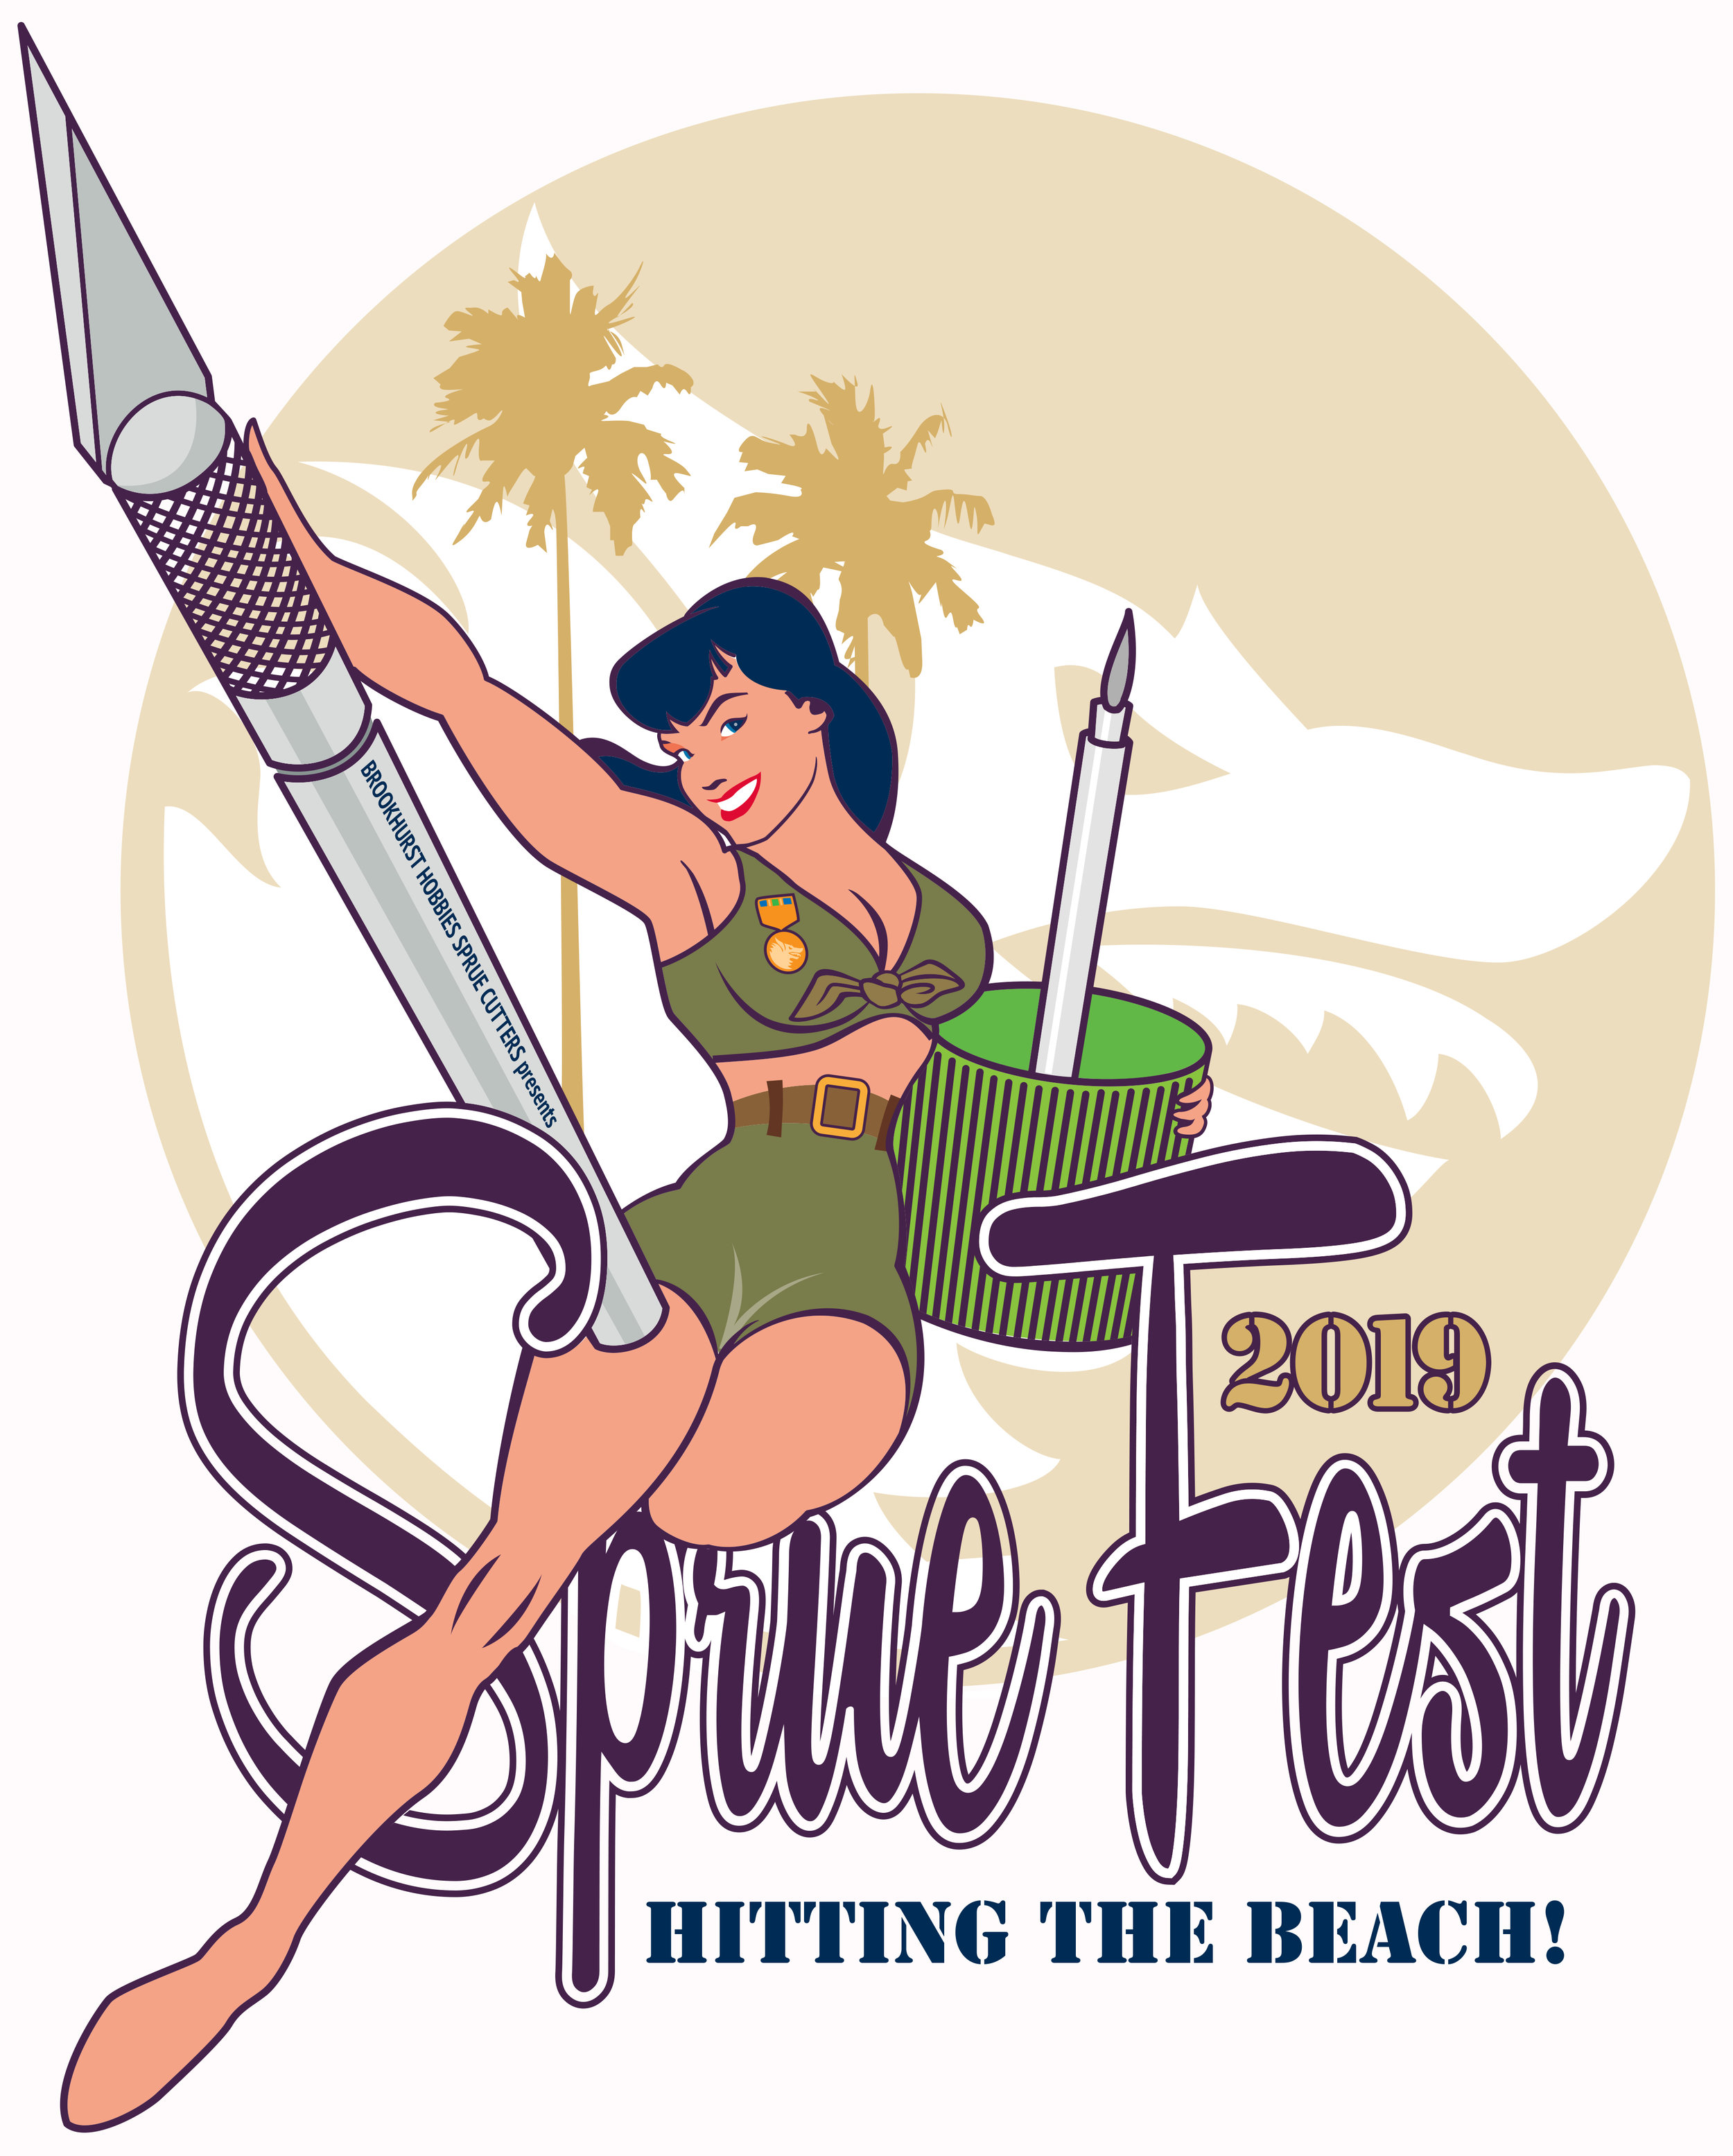 2019 SprueFest Logo.jpg